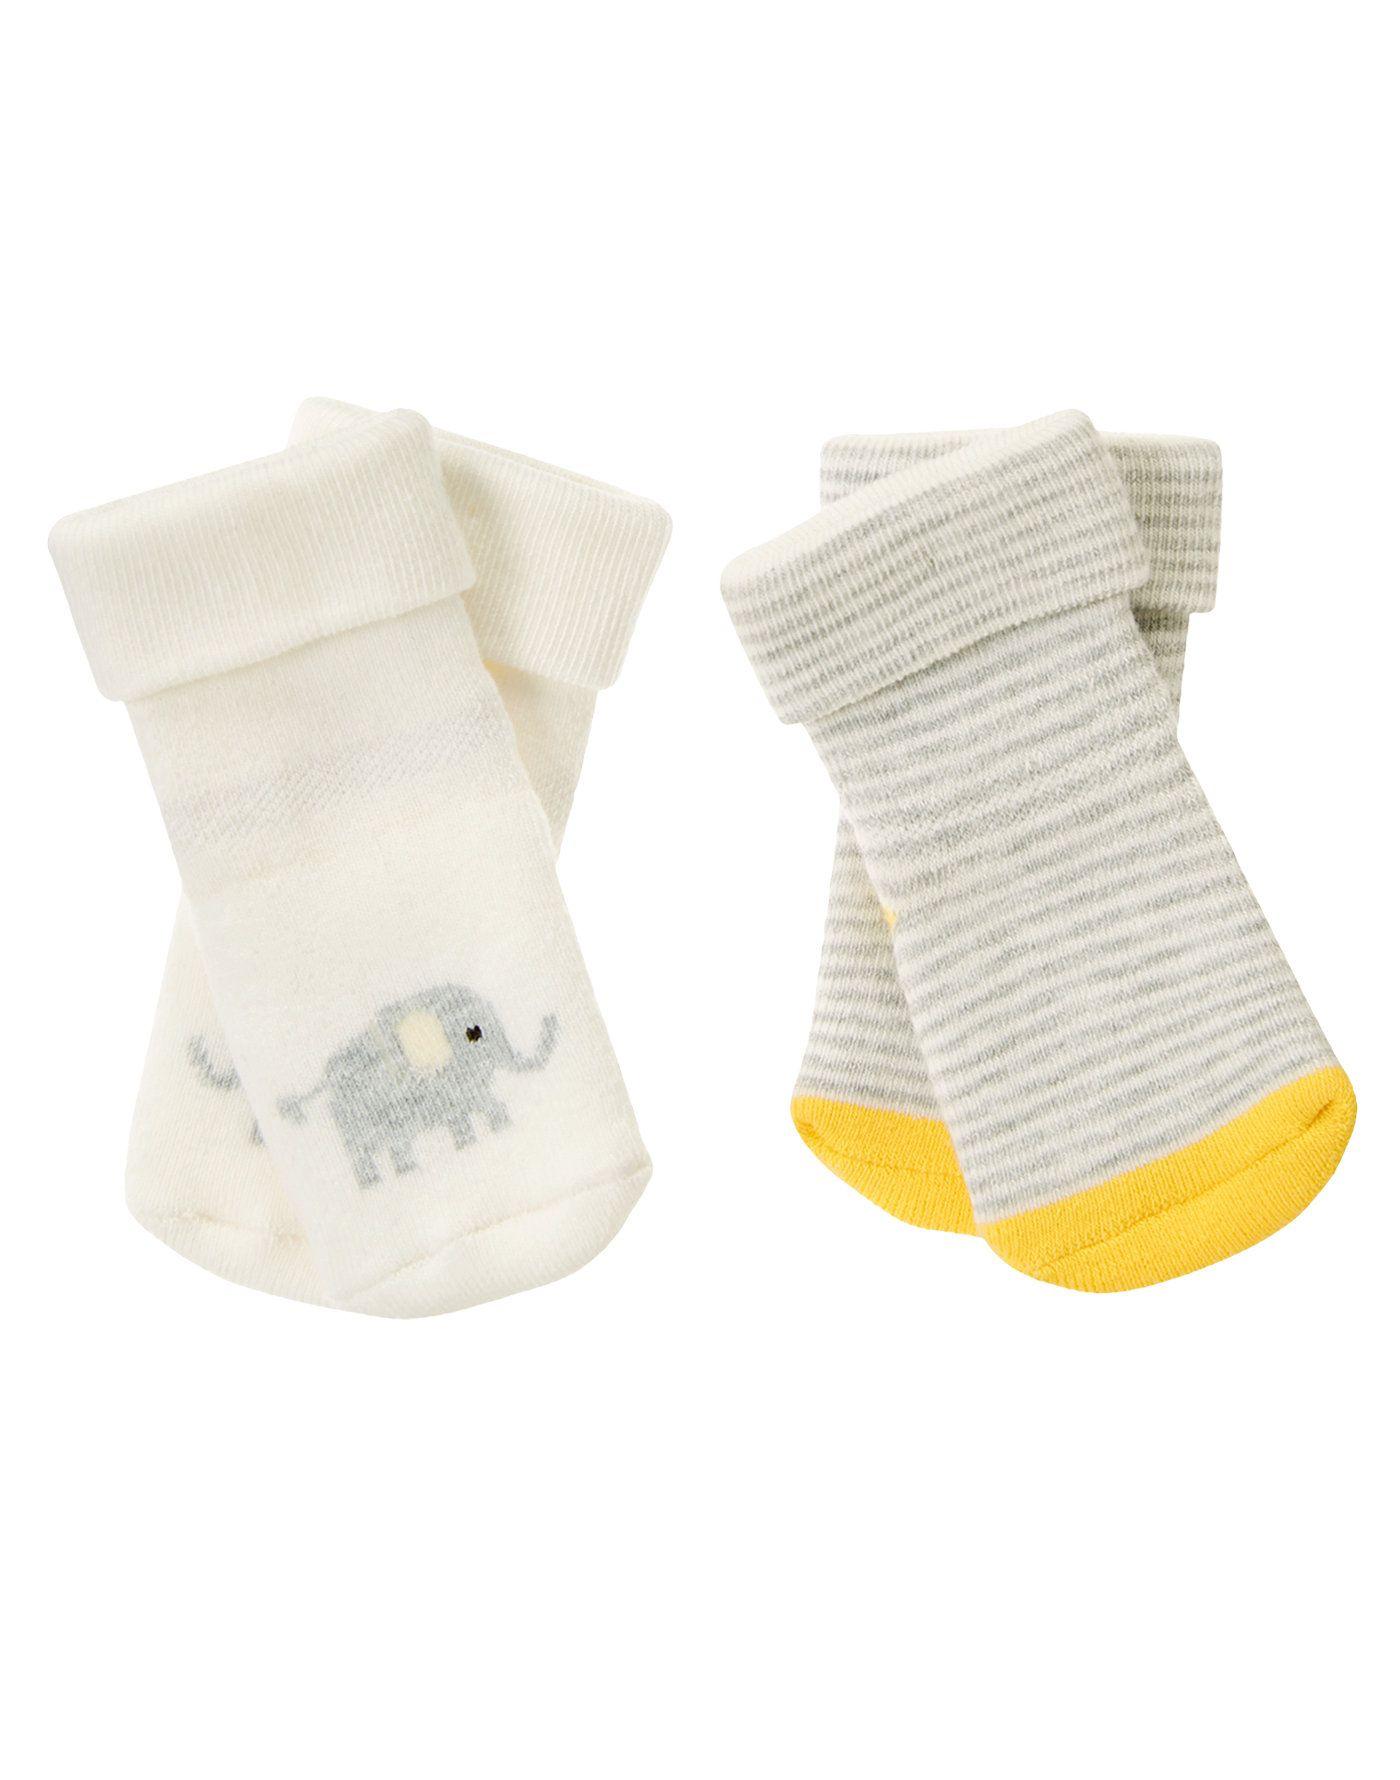 Elephant Socks Two Pack At Gymboree Boy Gymboree Pinterest